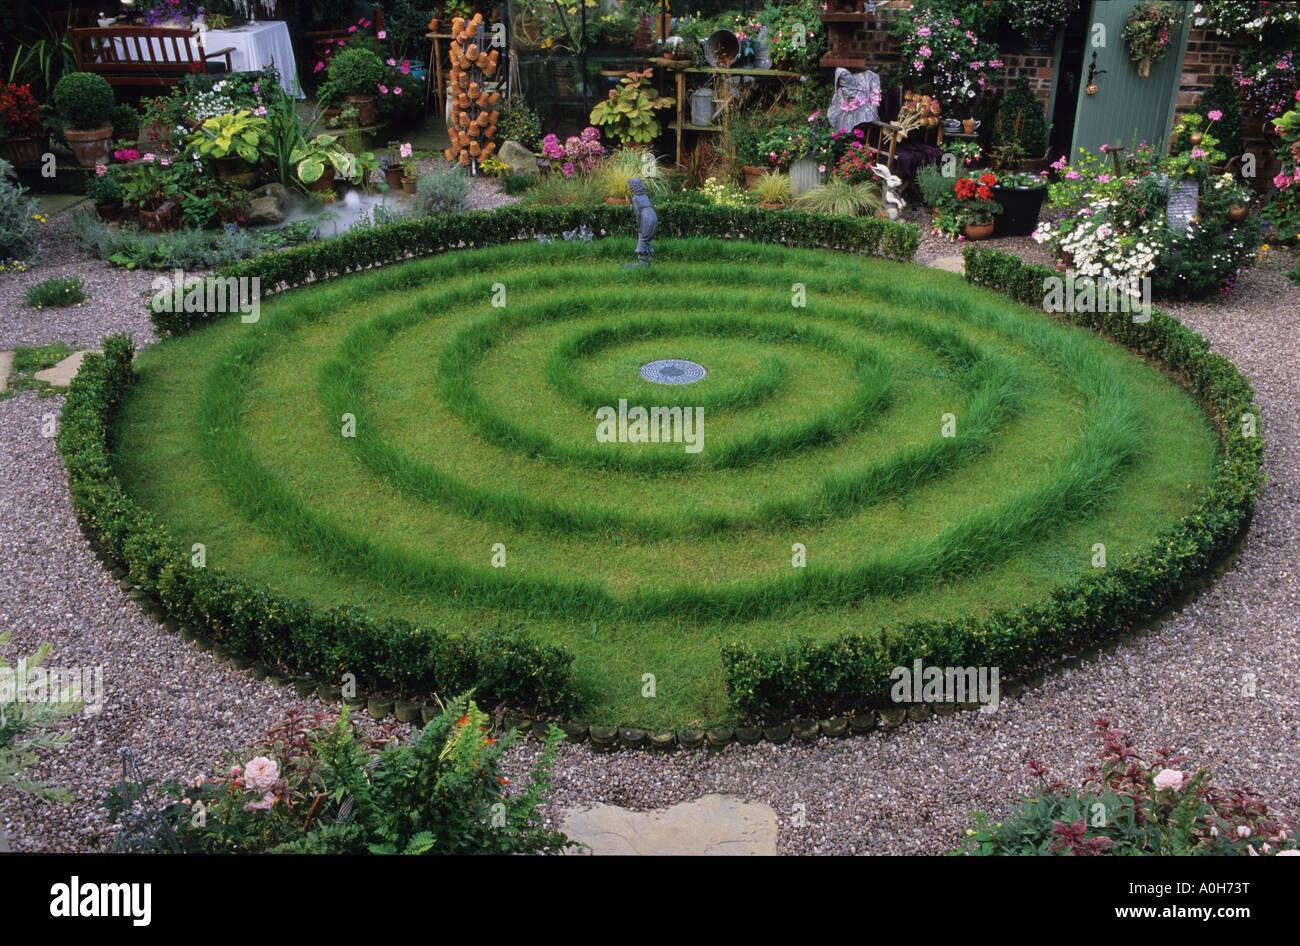 Woodside rd chester small suburban town garden with for Circular lawn garden designs